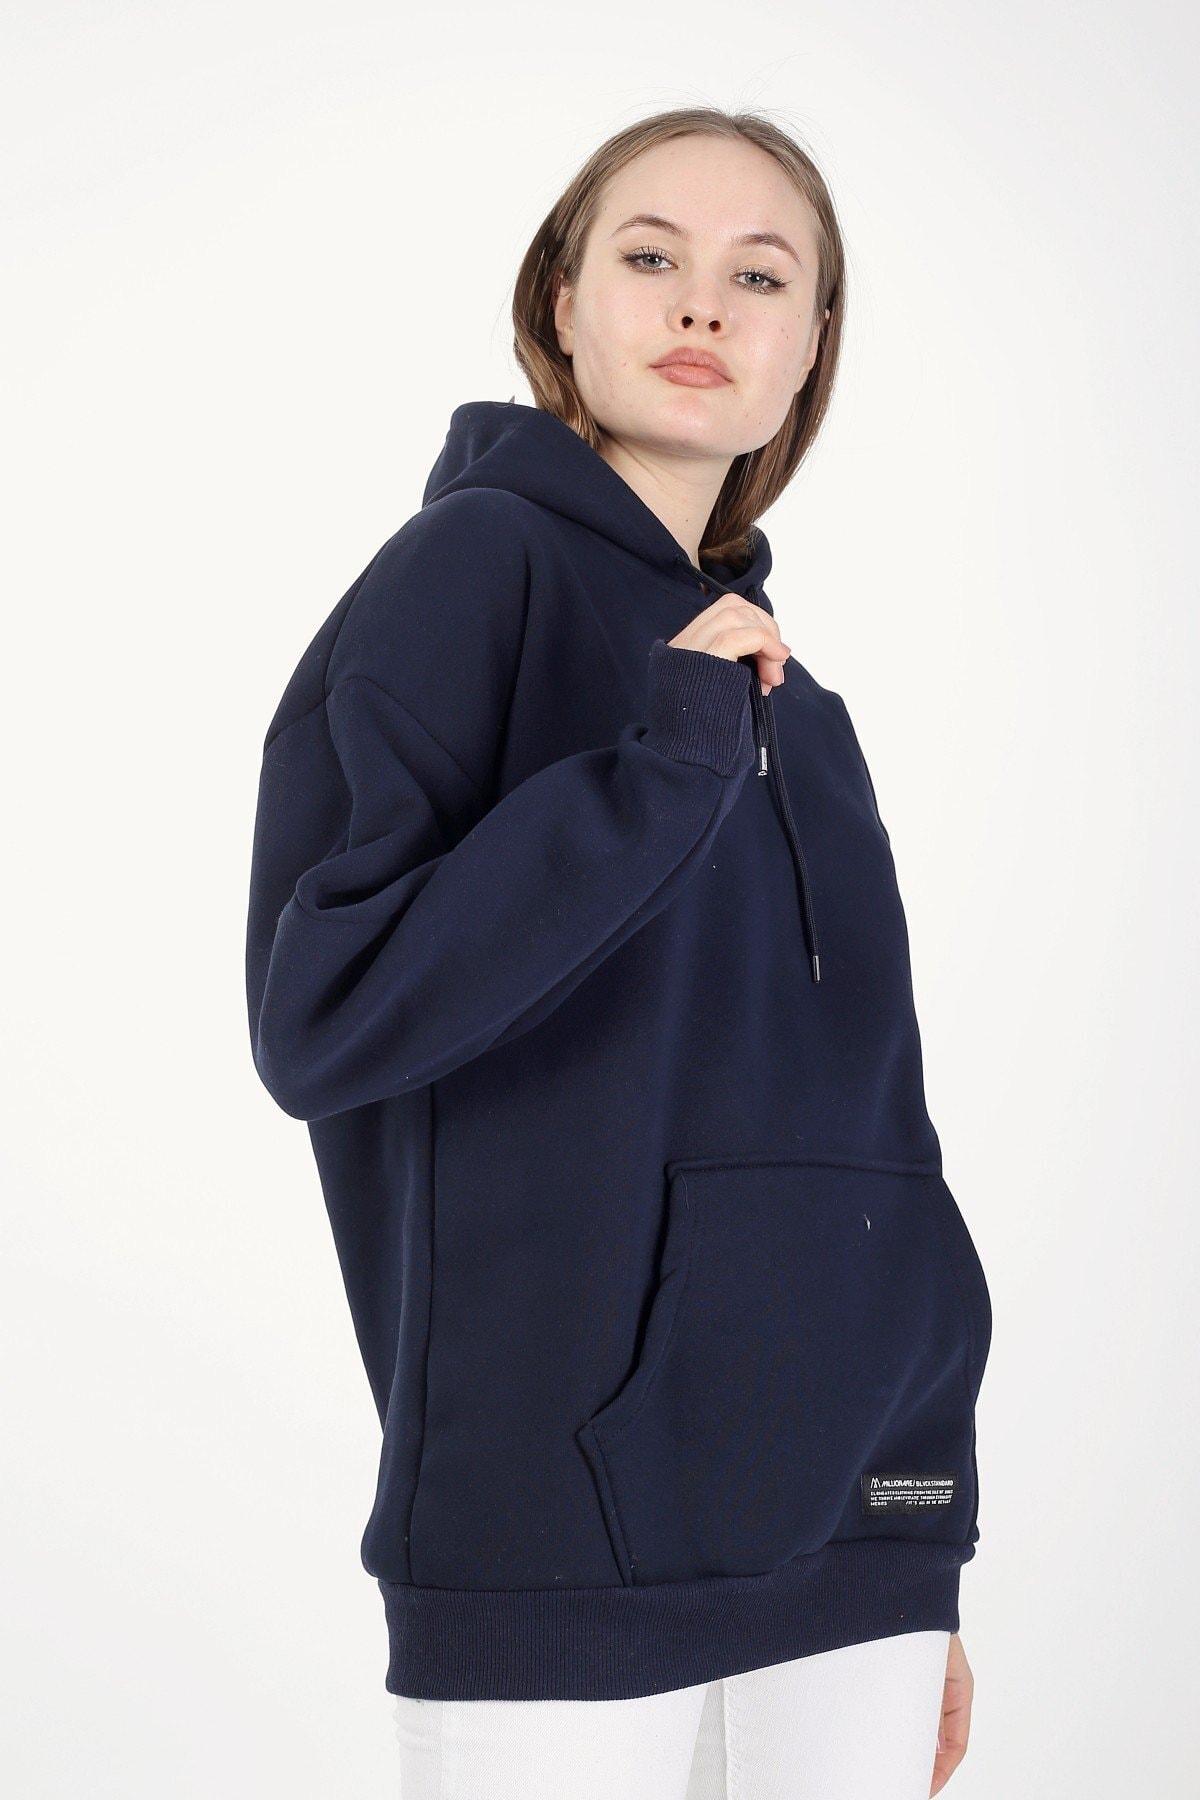 Millionaire Kadın Lacivert Kapşonlu Oversize Sweatshirt 2